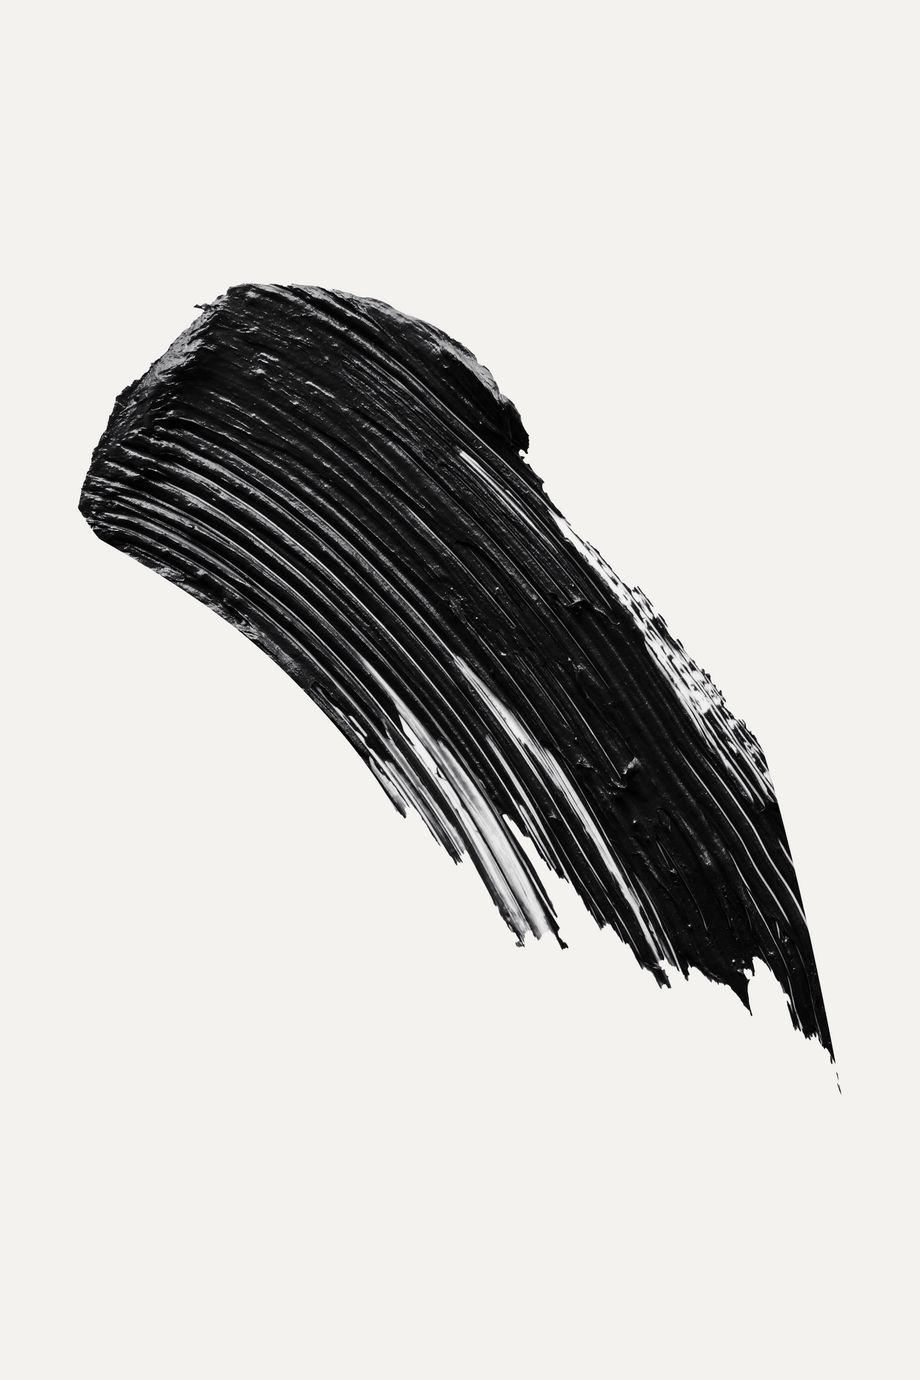 Burberry Beauty 猫眼魅惑睫毛膏(色号:Ultra Black No.01)